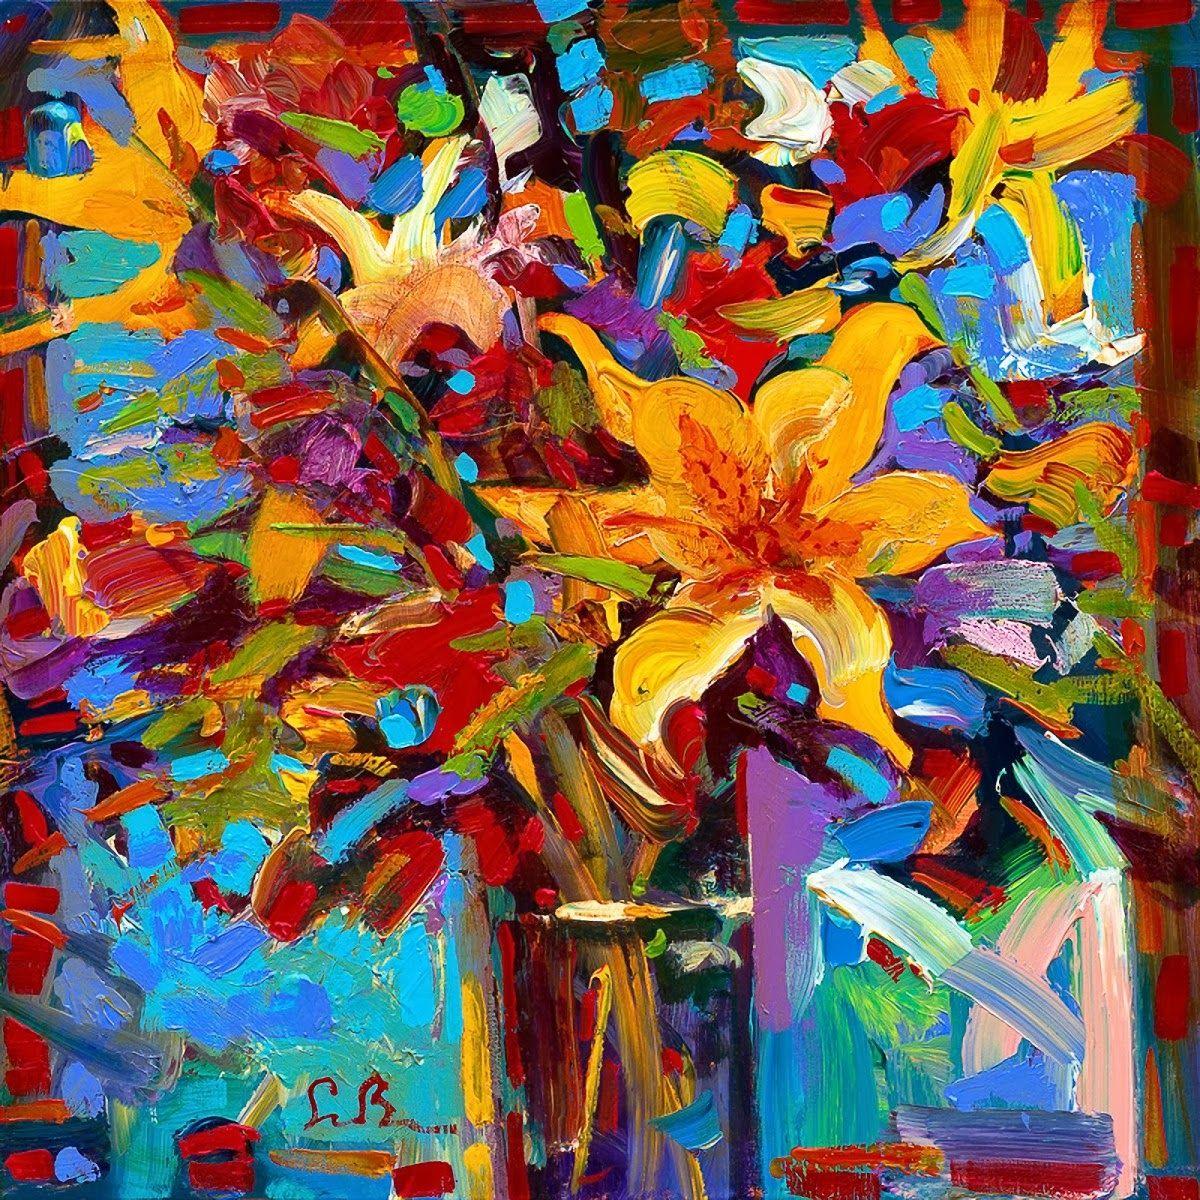 Simon Bull Ditulis Oleh Seni Rupa Title 36 Lukisan Bunga